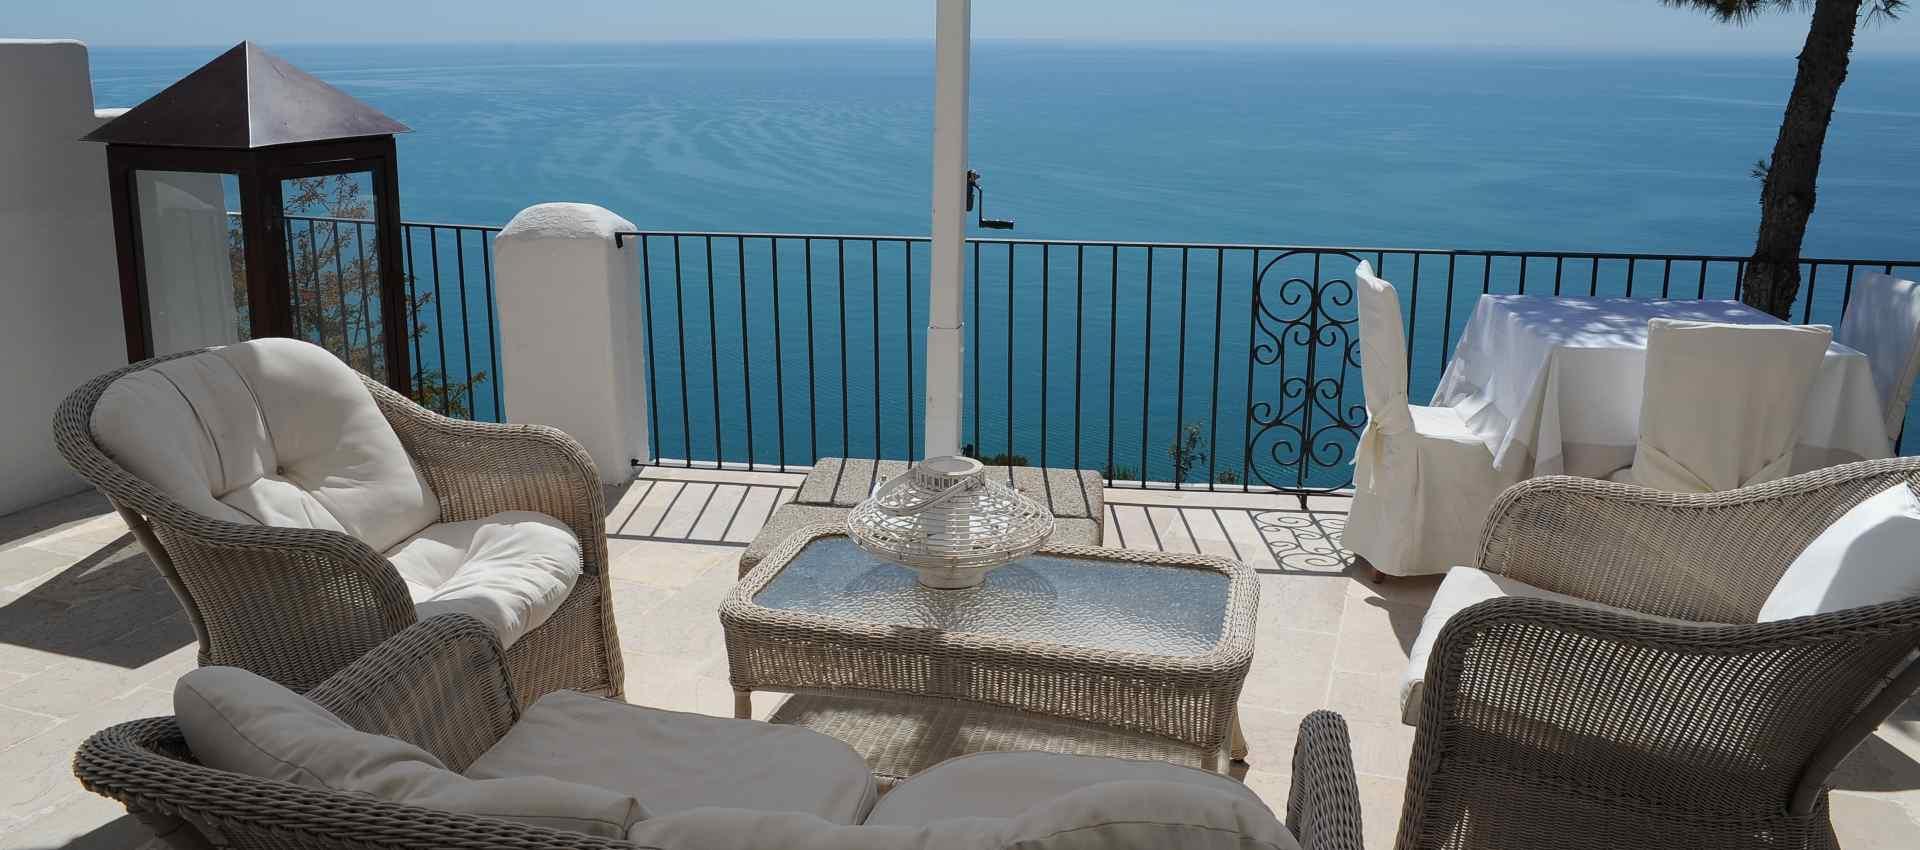 Boutique resort spa albergo hotel 4 stelle mare mattinata for Boutique hotel gargano